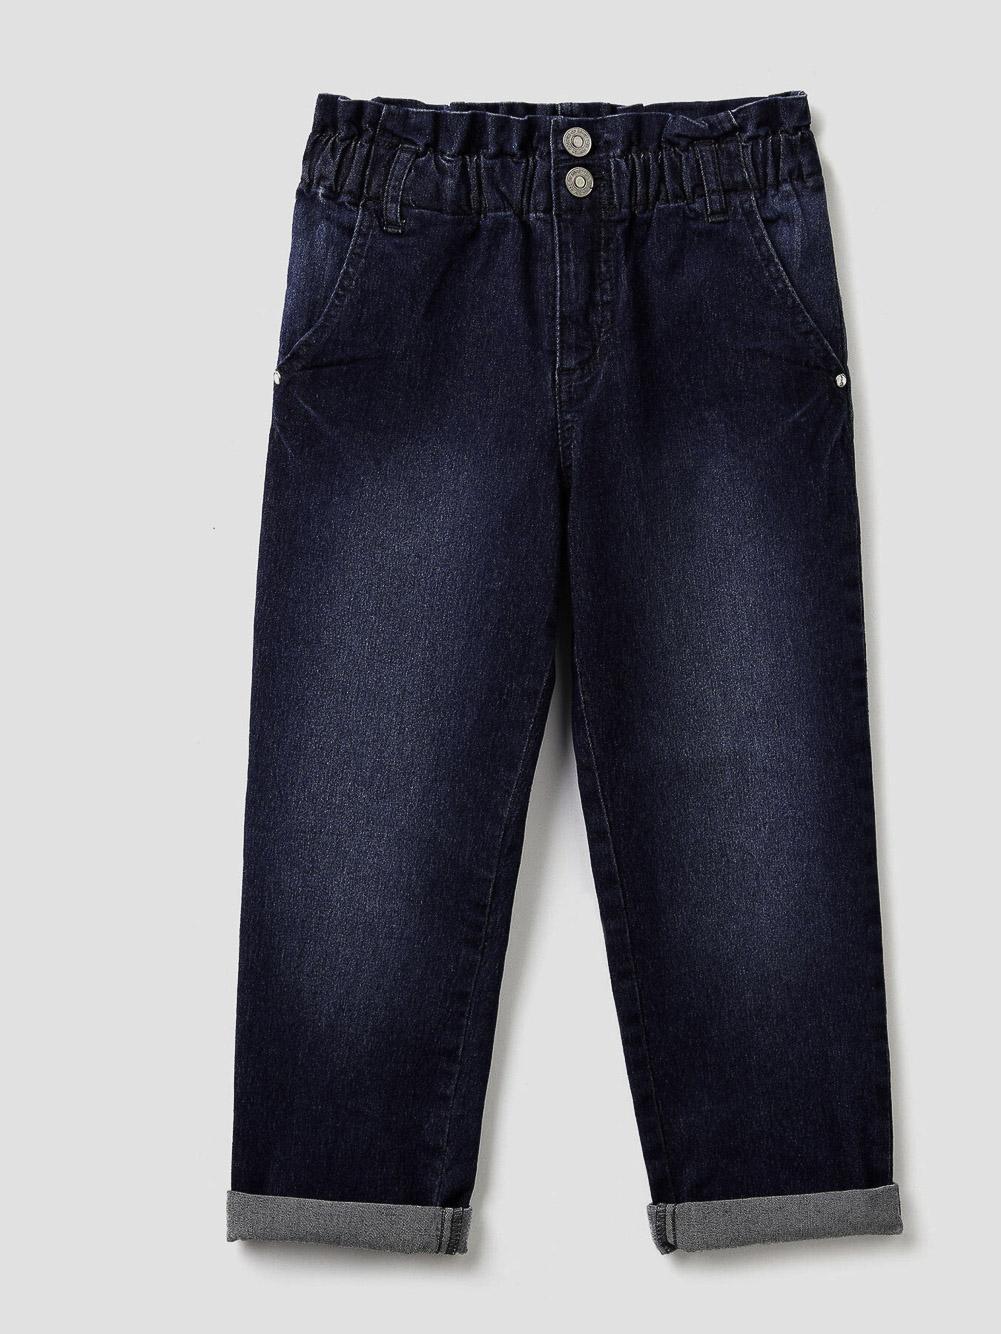 012 BENETTON Τζιν παντελόνι 4DUR55CI0 20A911